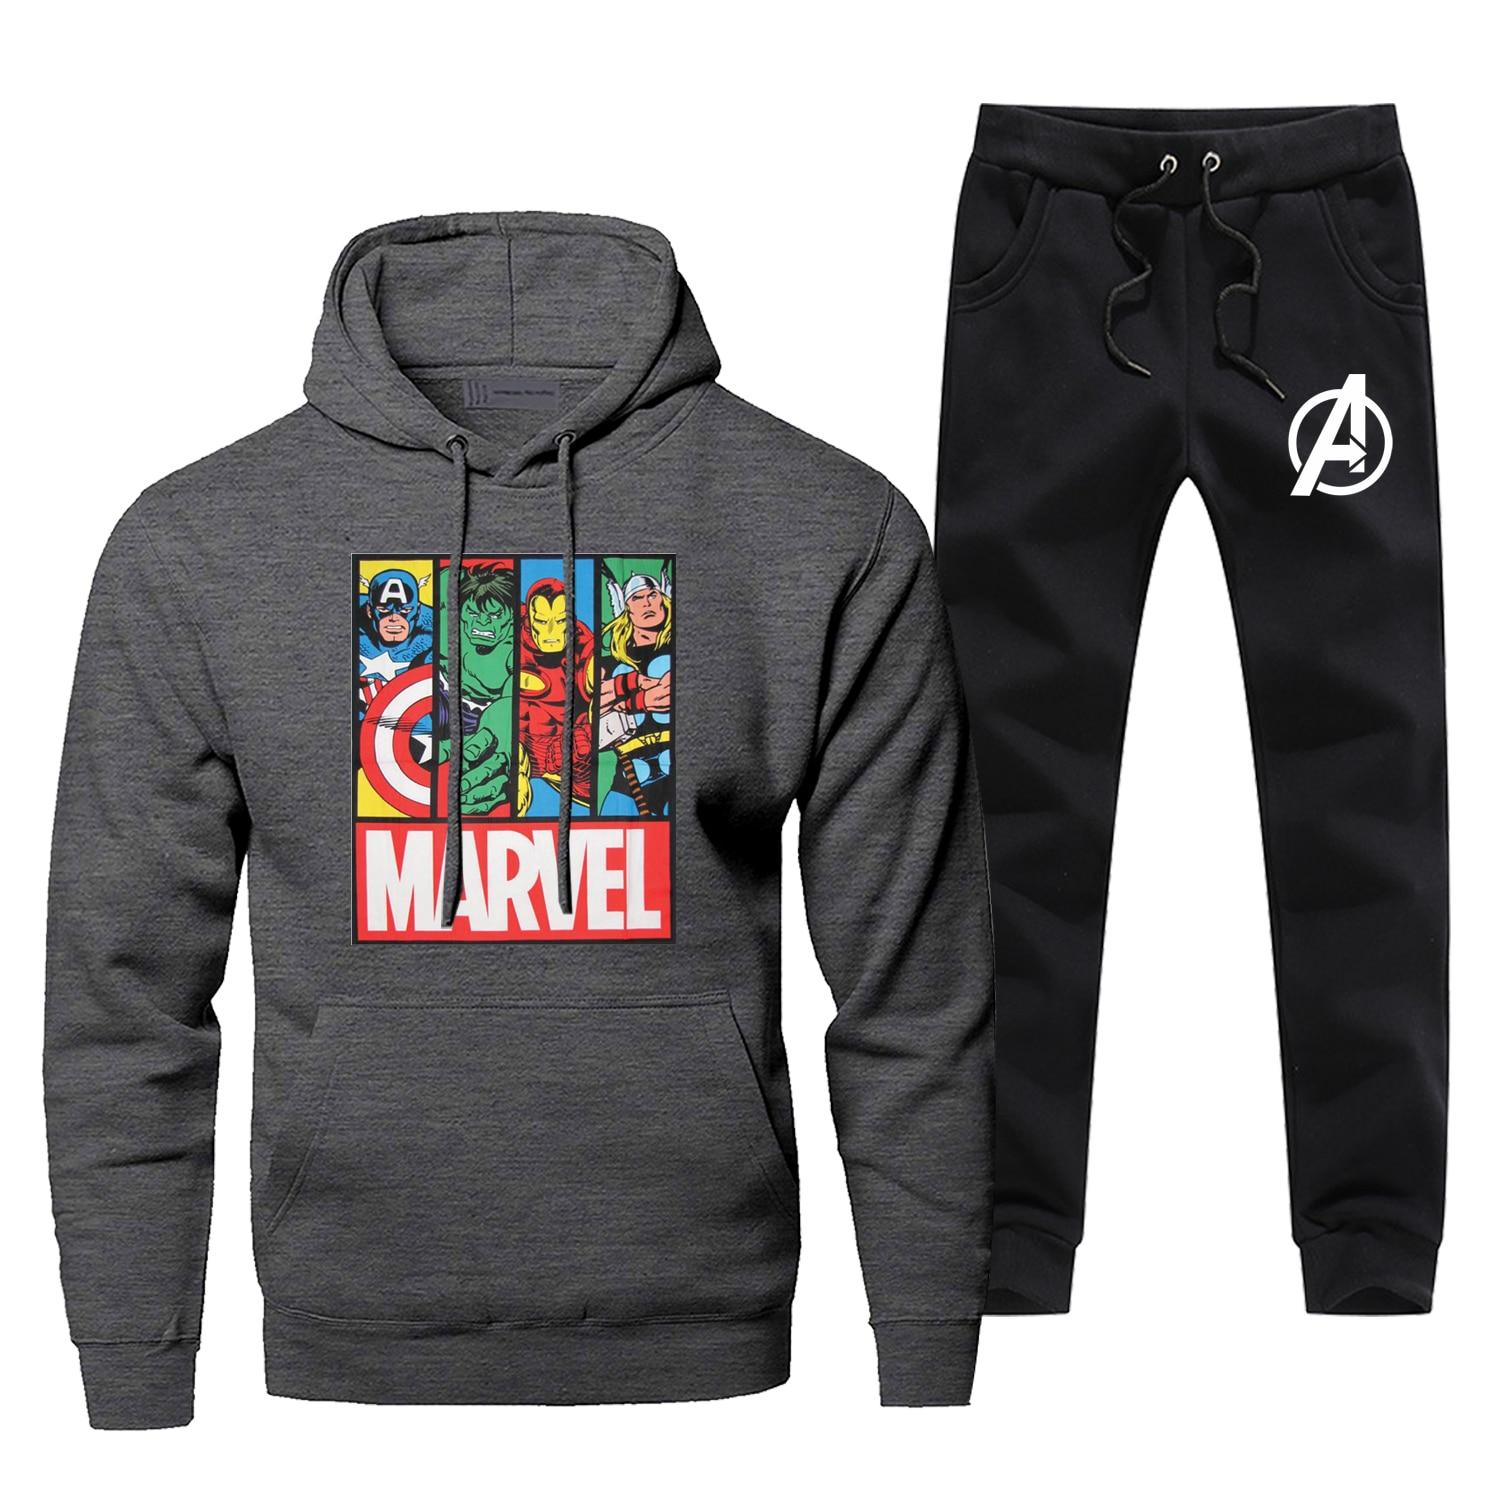 The Marvel Super Hero Tracksuit Iron Man Captain America Hulk Thor Odinson Fashion Mens Hoodies+pants 2pc Sets Fleece Sportswear